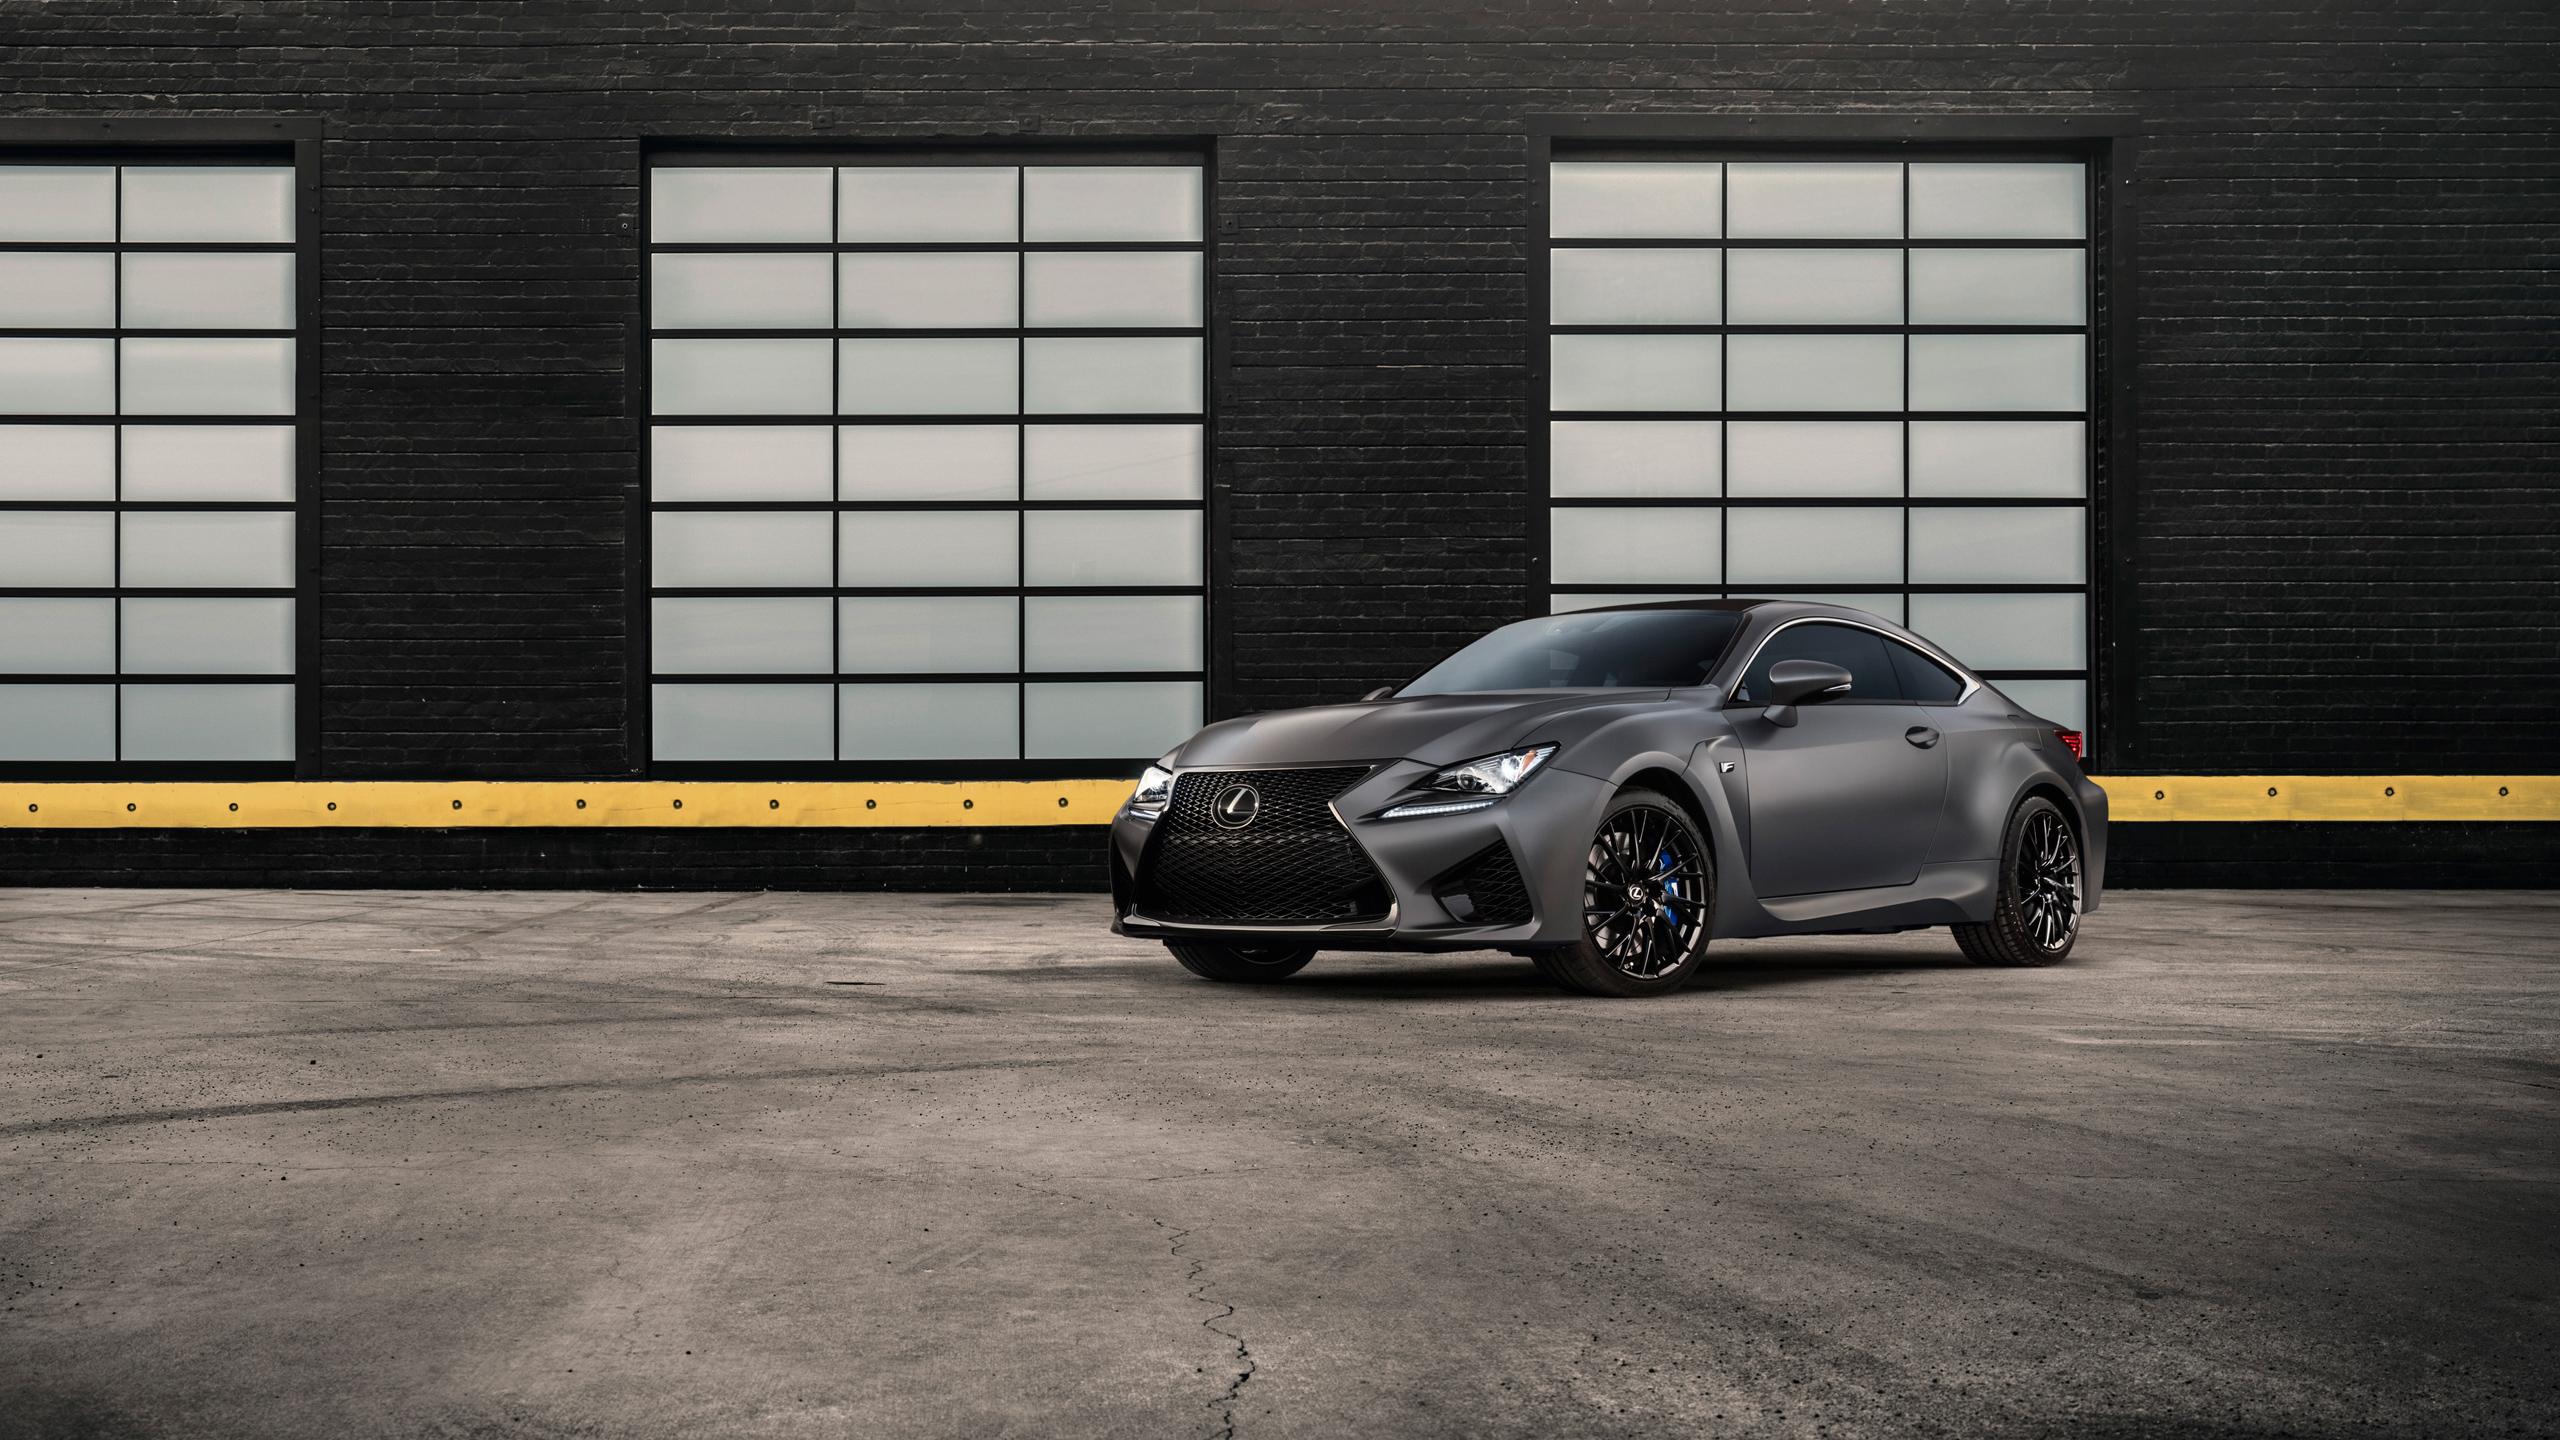 Lexus rc f wallpaper